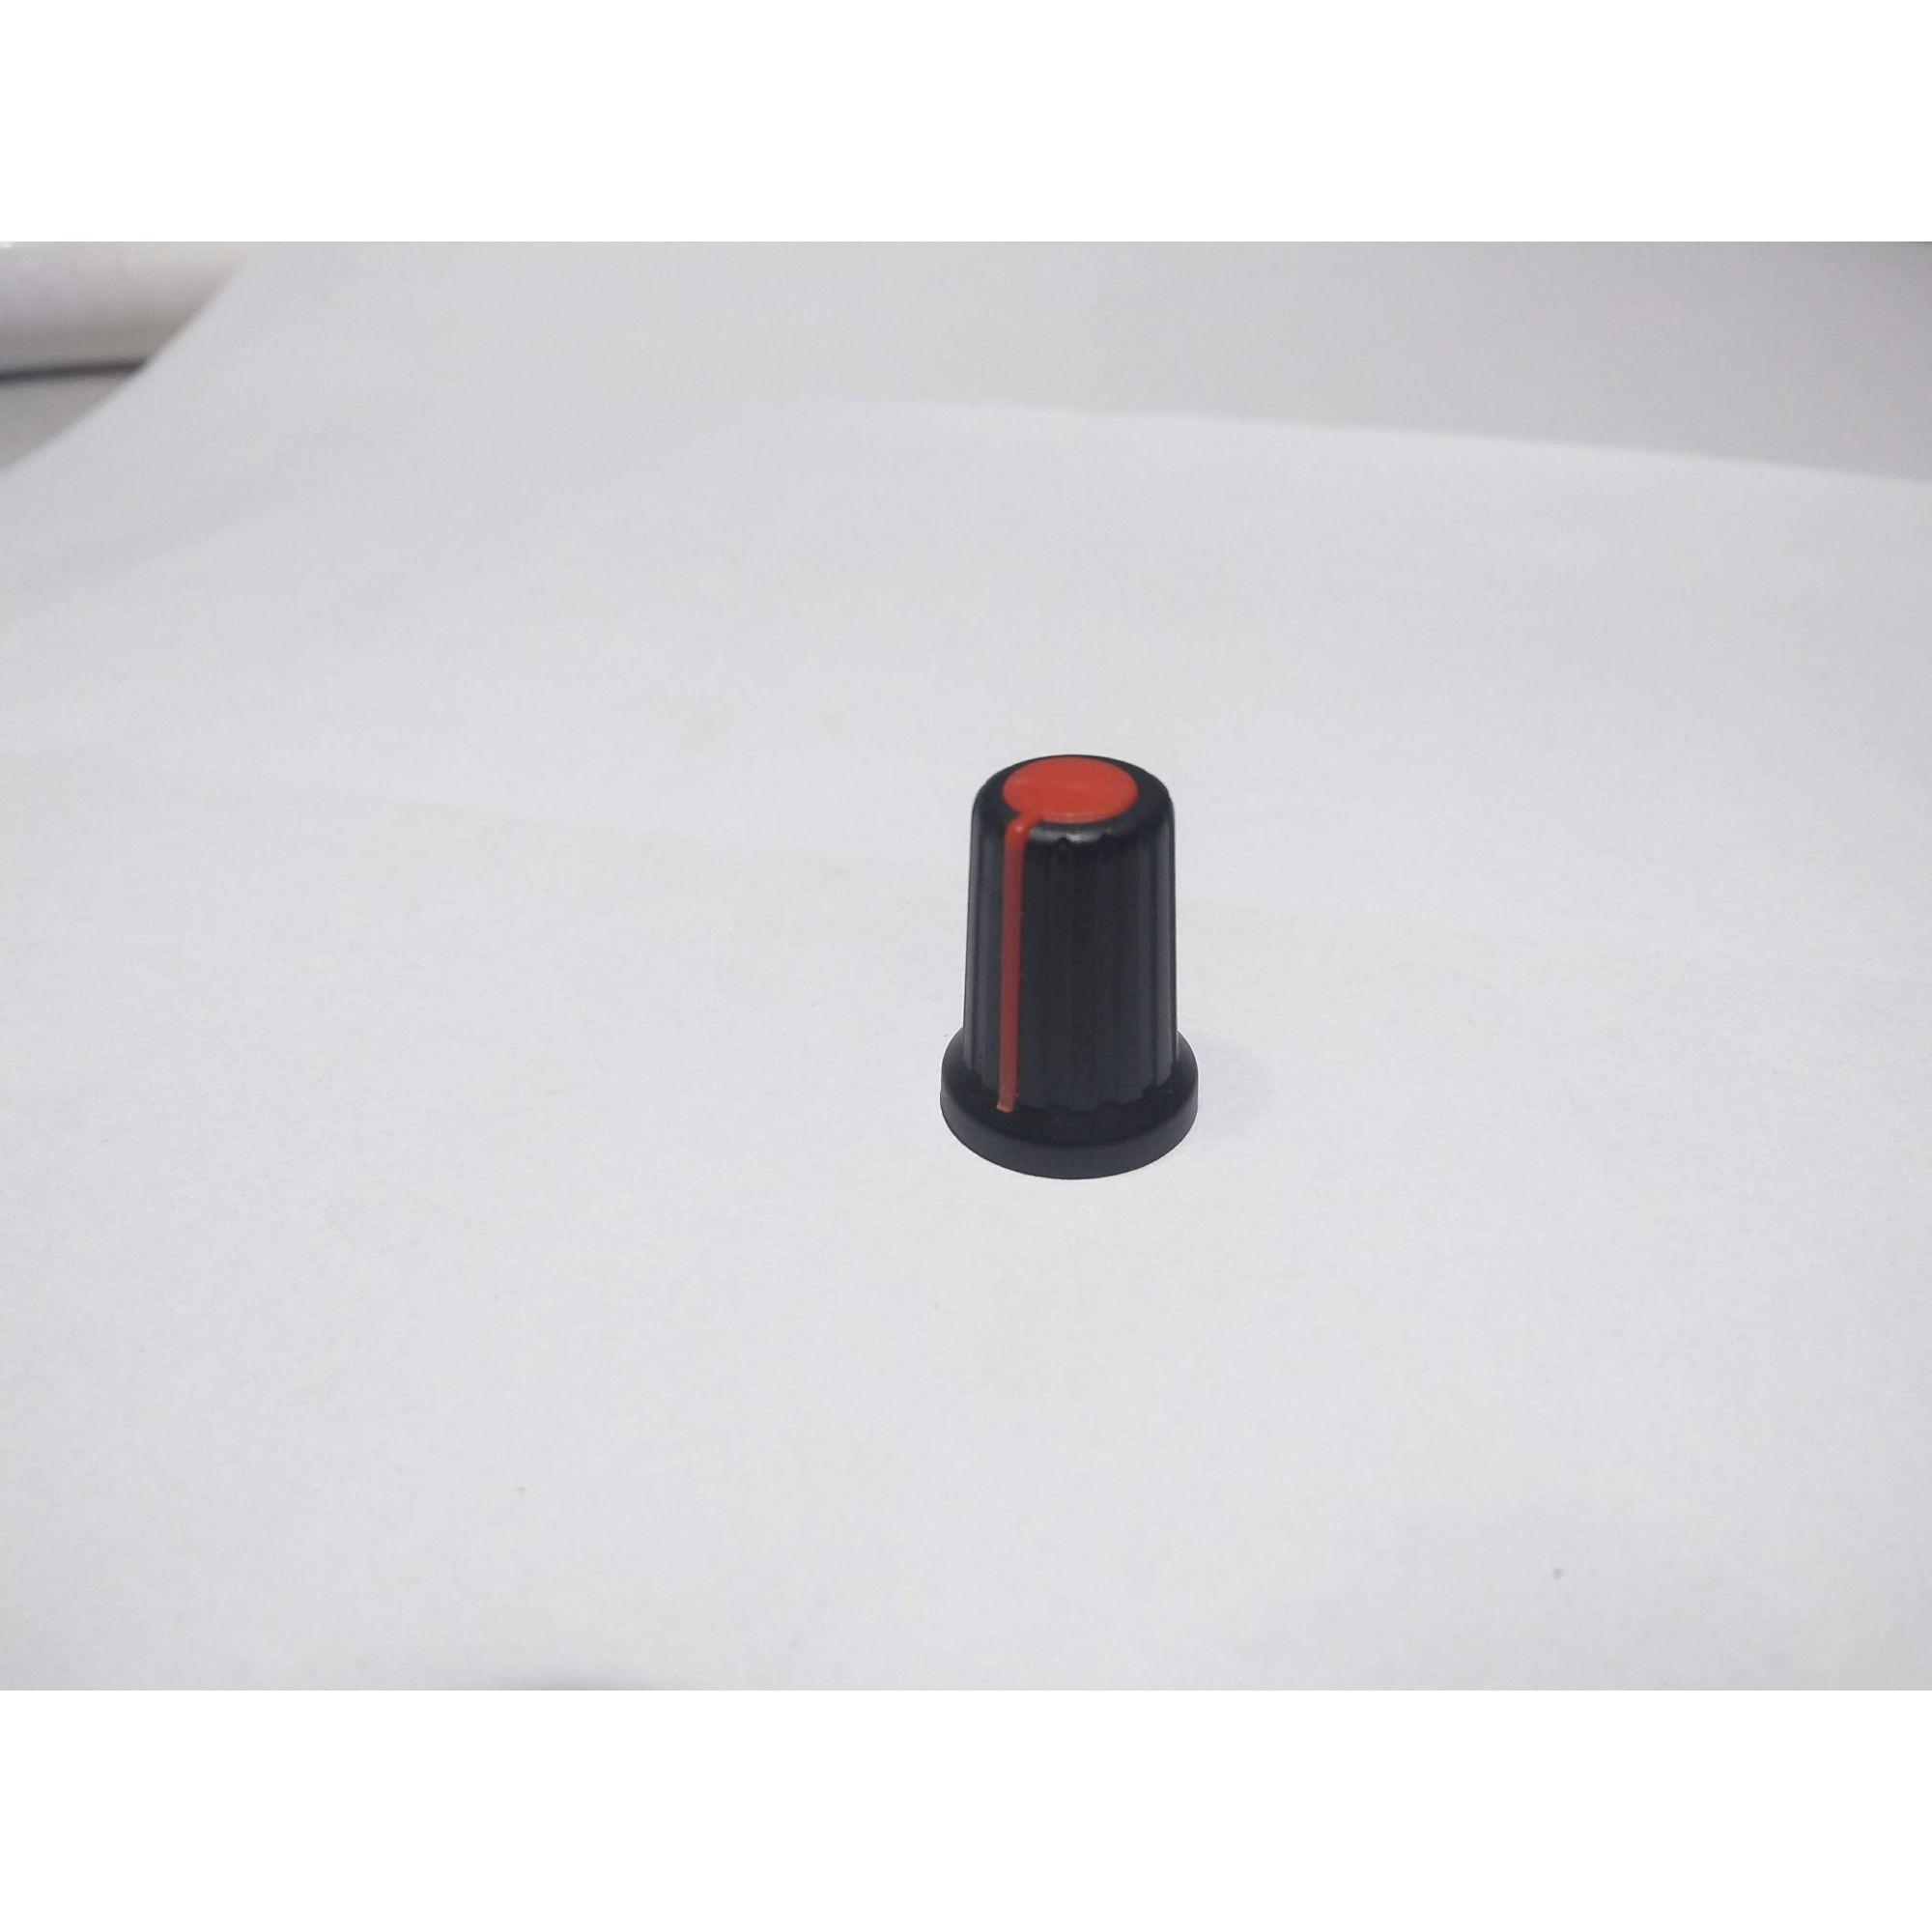 Knob para potenciômetro Vermelho